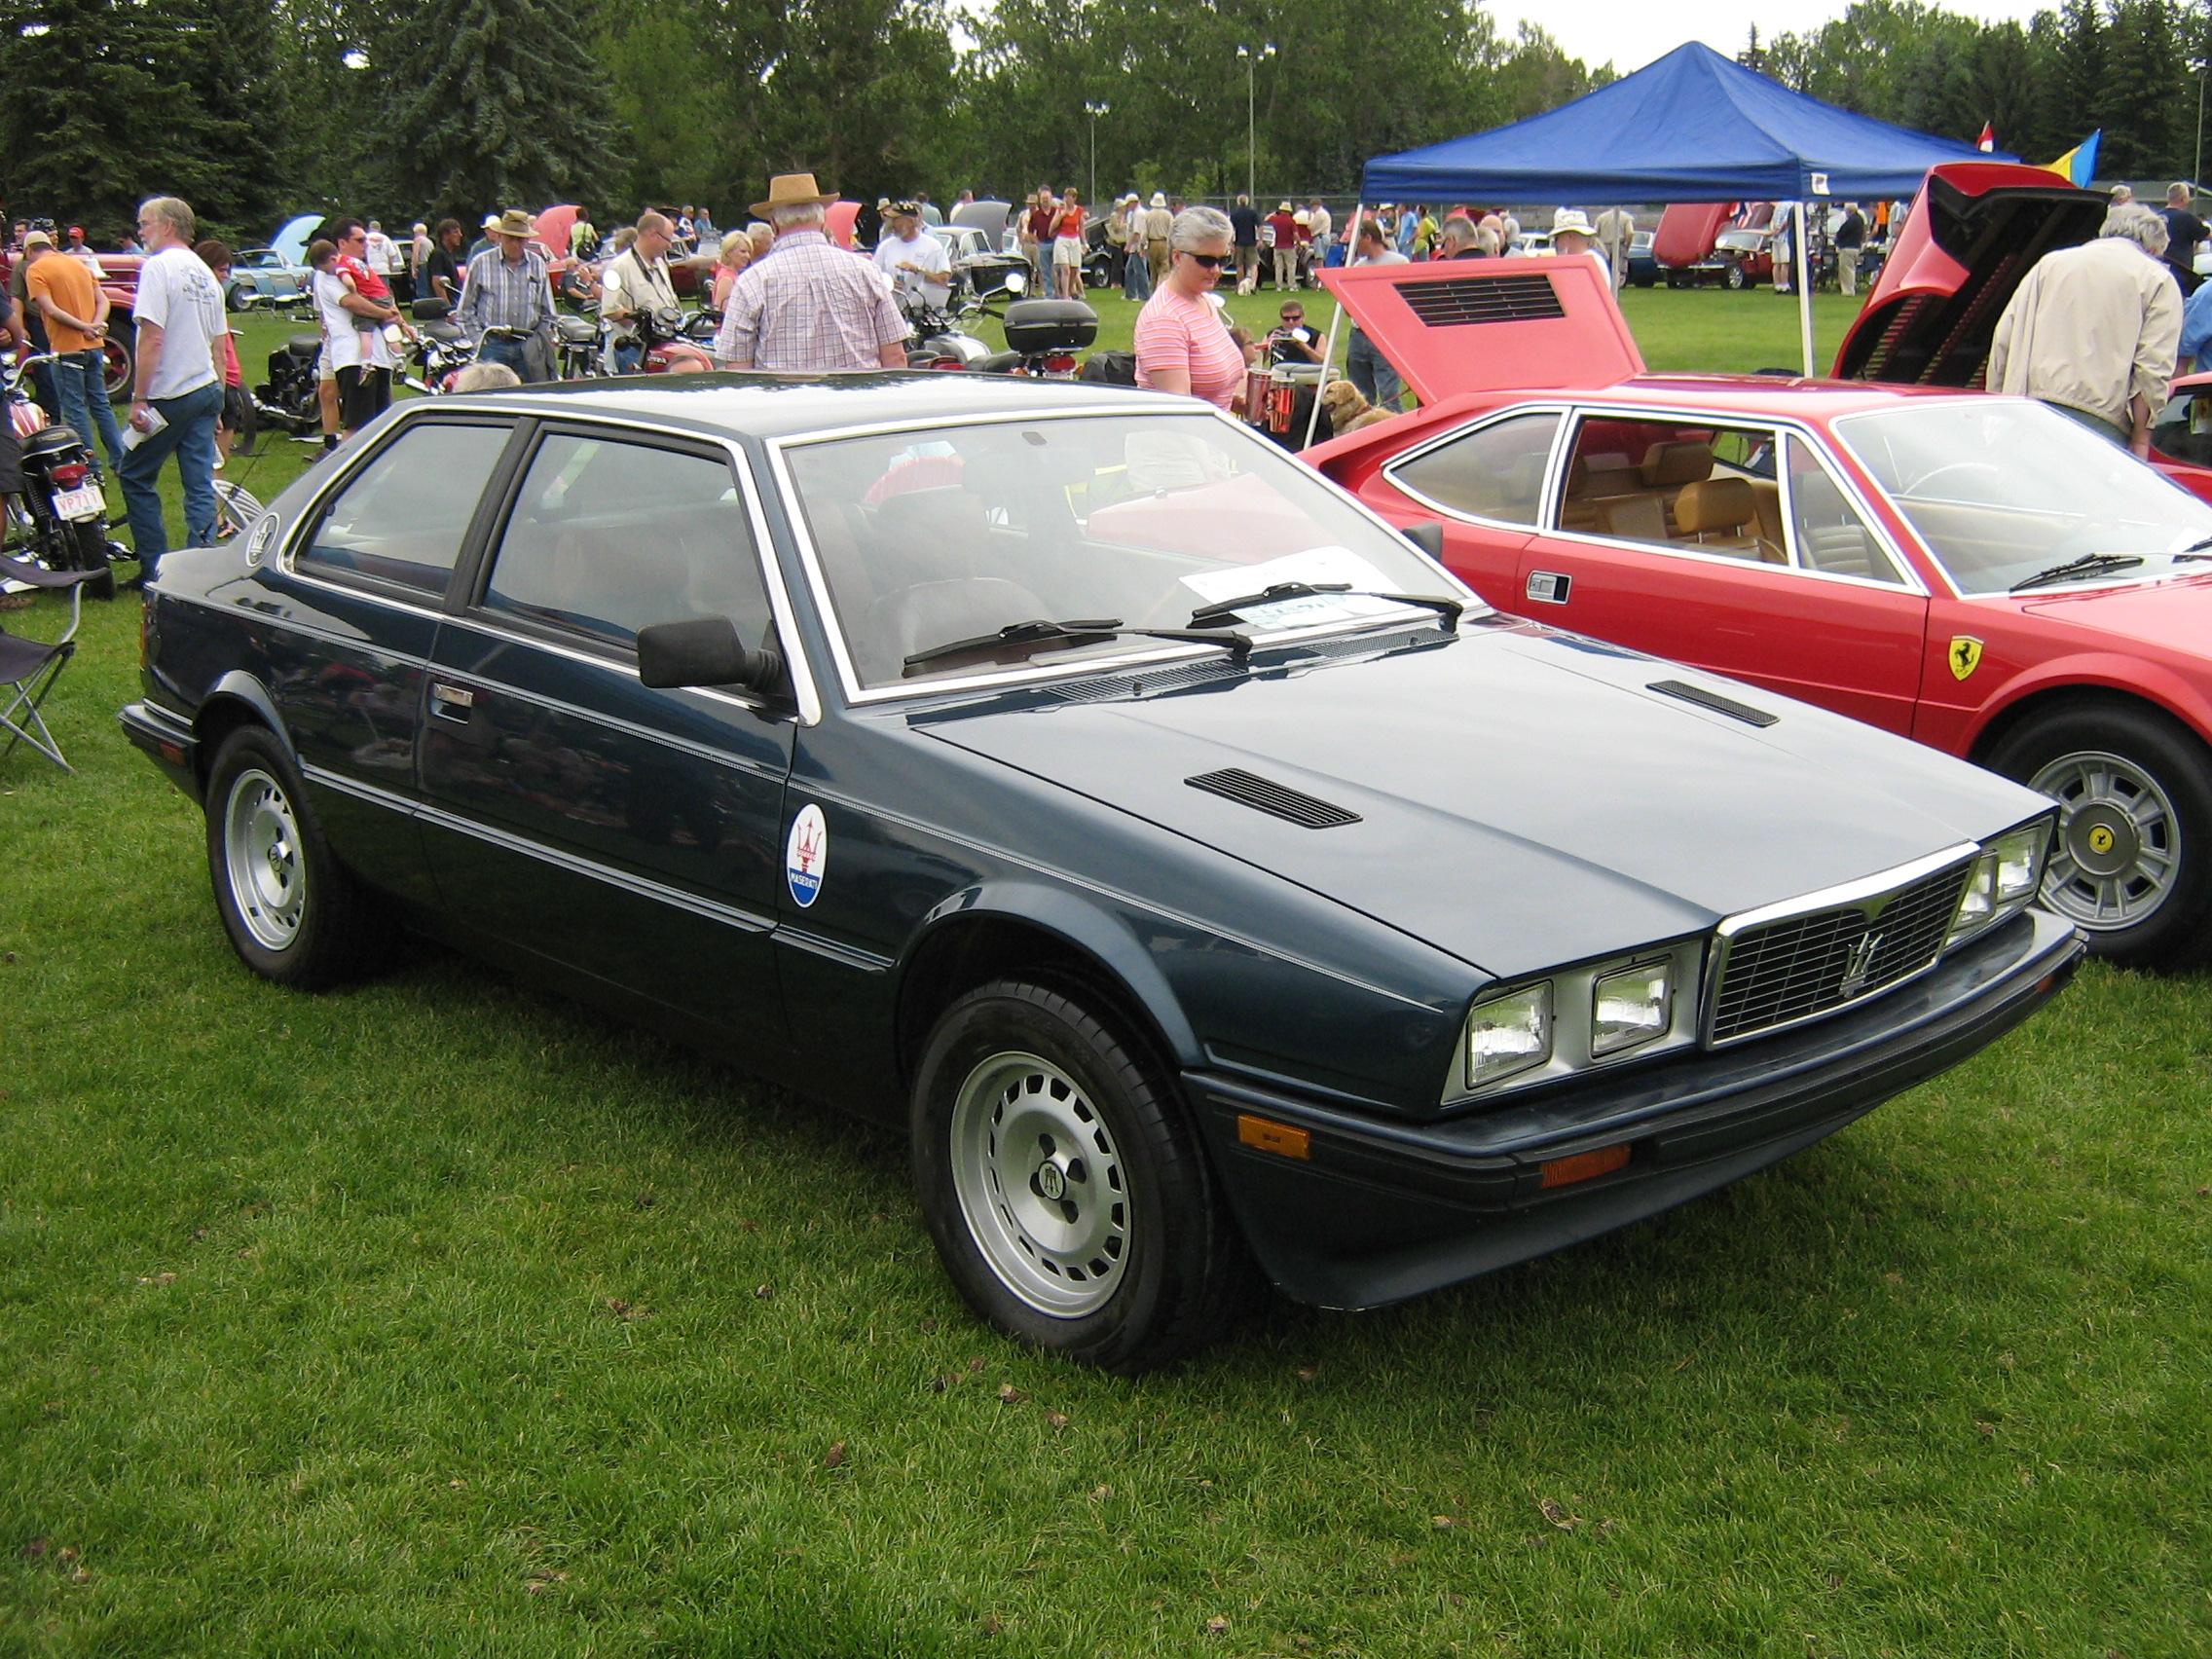 File:1984 Maserati BiTurbo.jpg - Wikimedia Commons